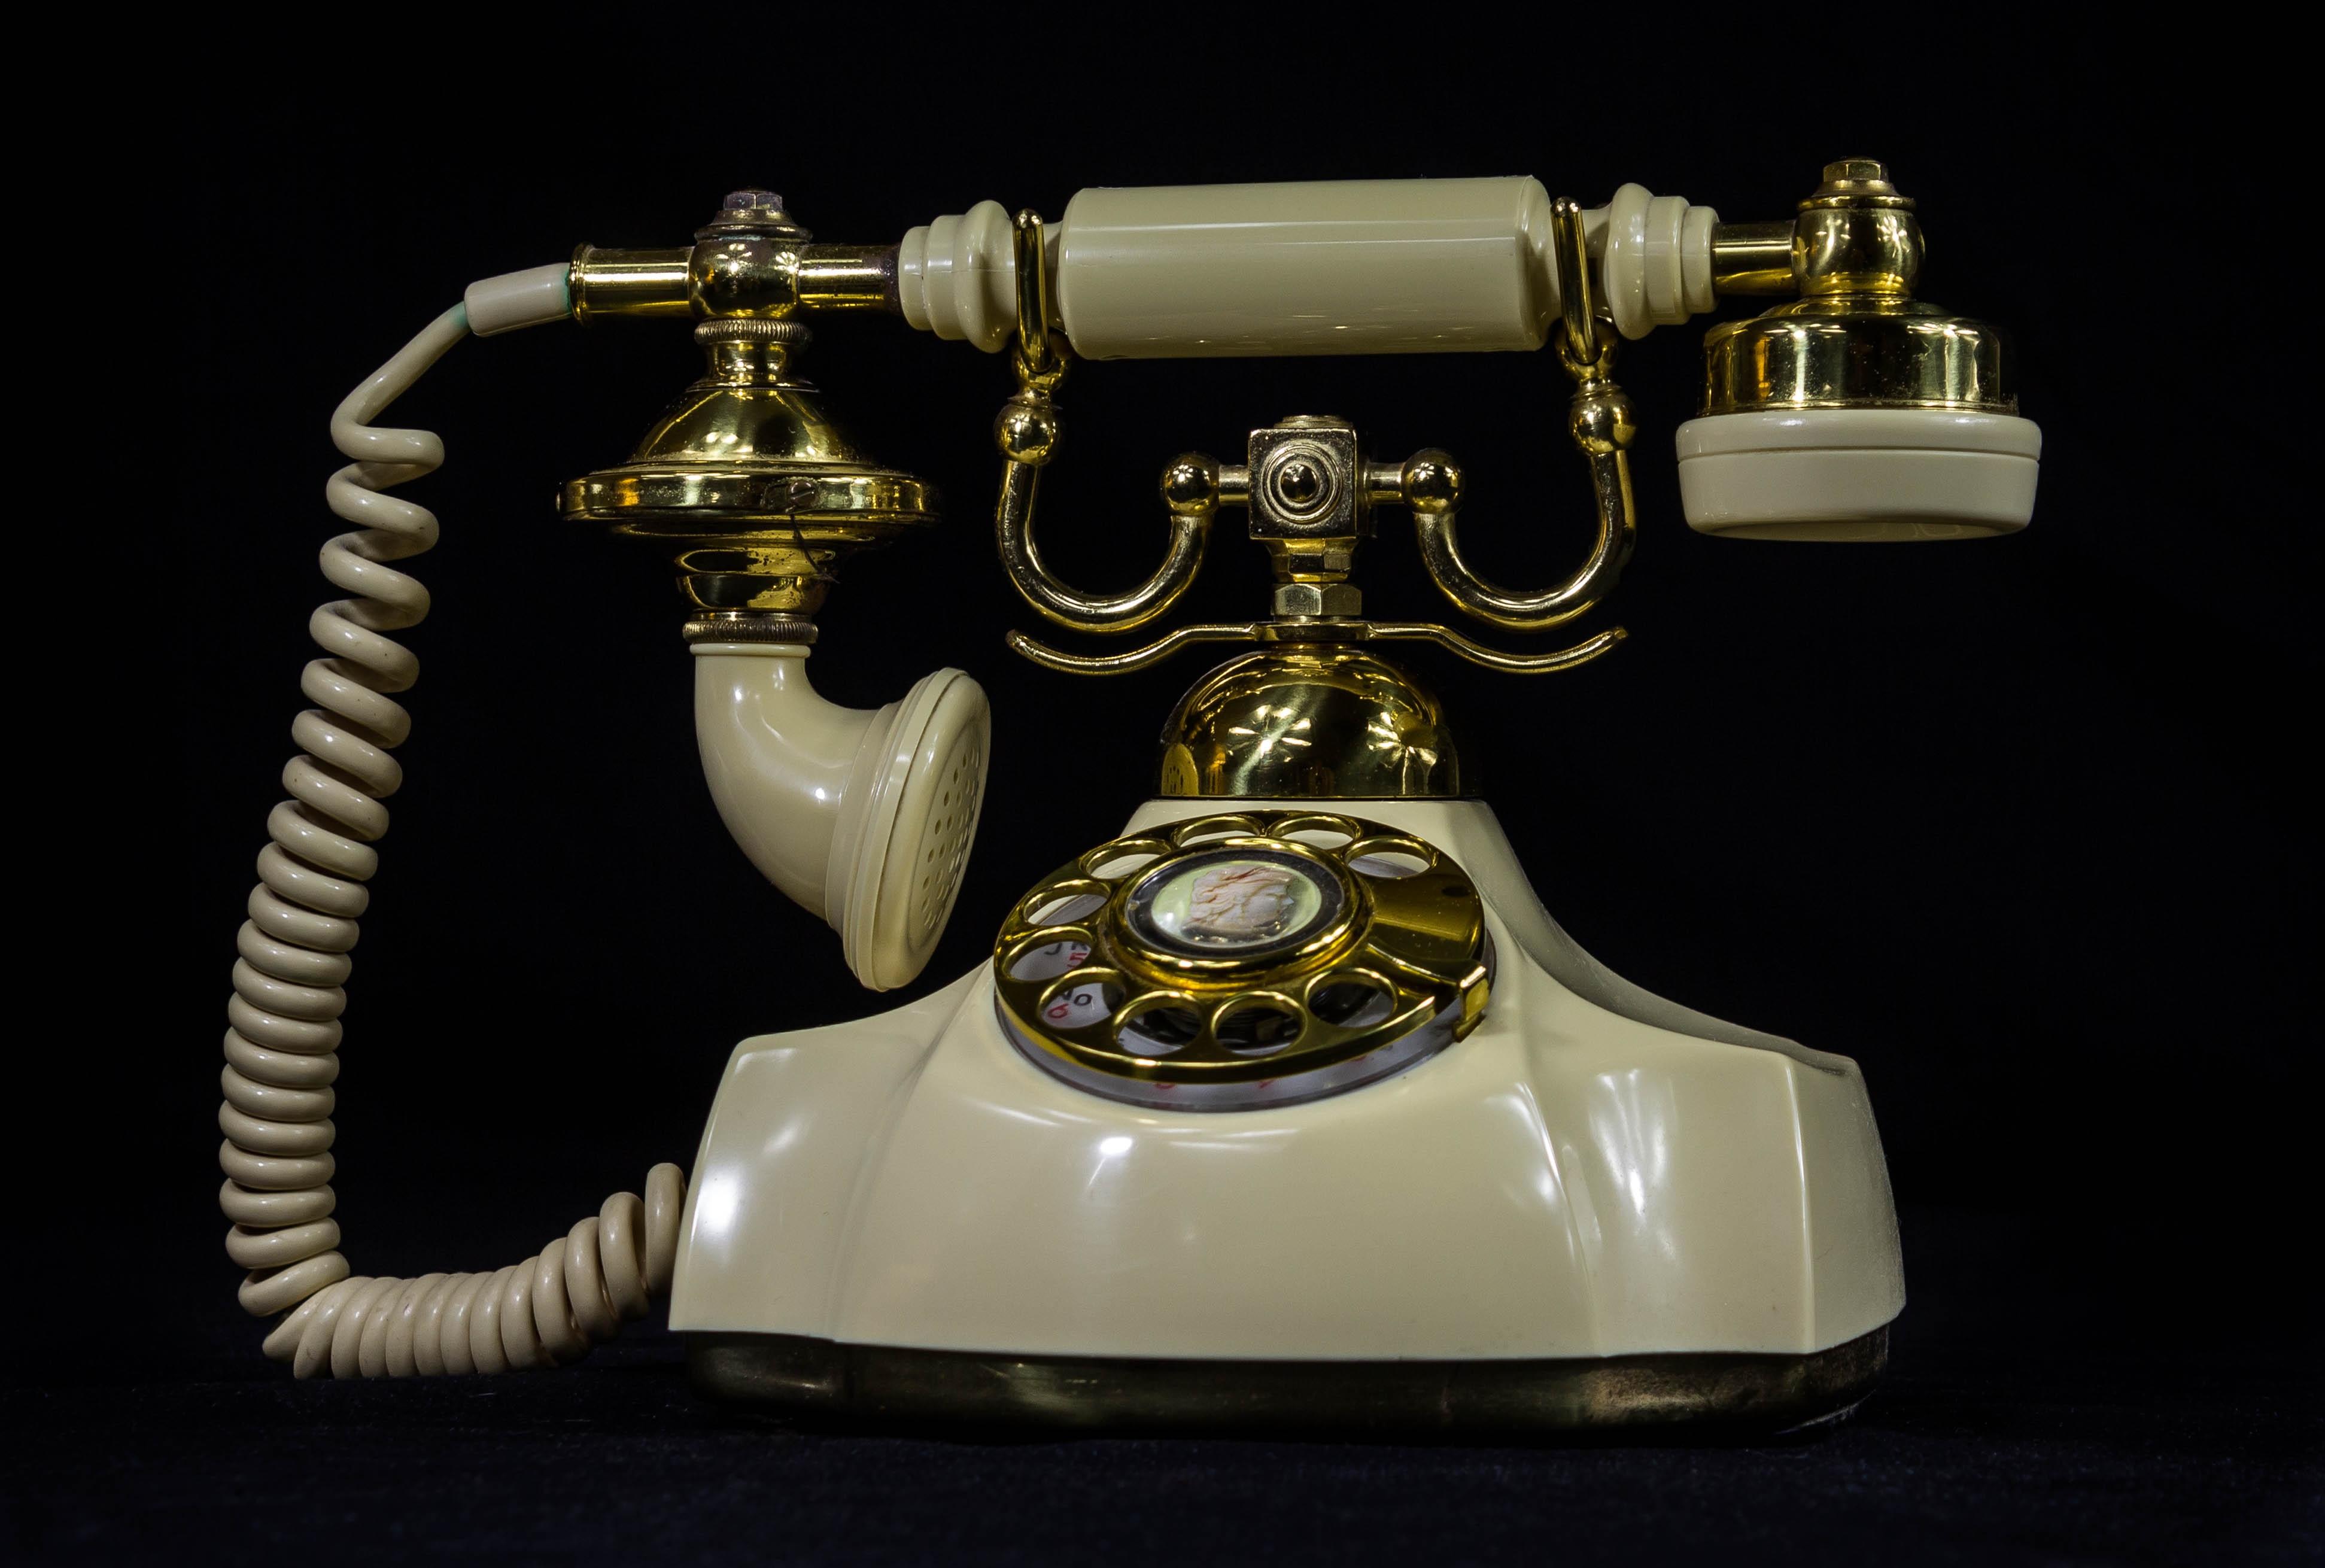 Free Images : communication, vintage telephone, old phone, rotary